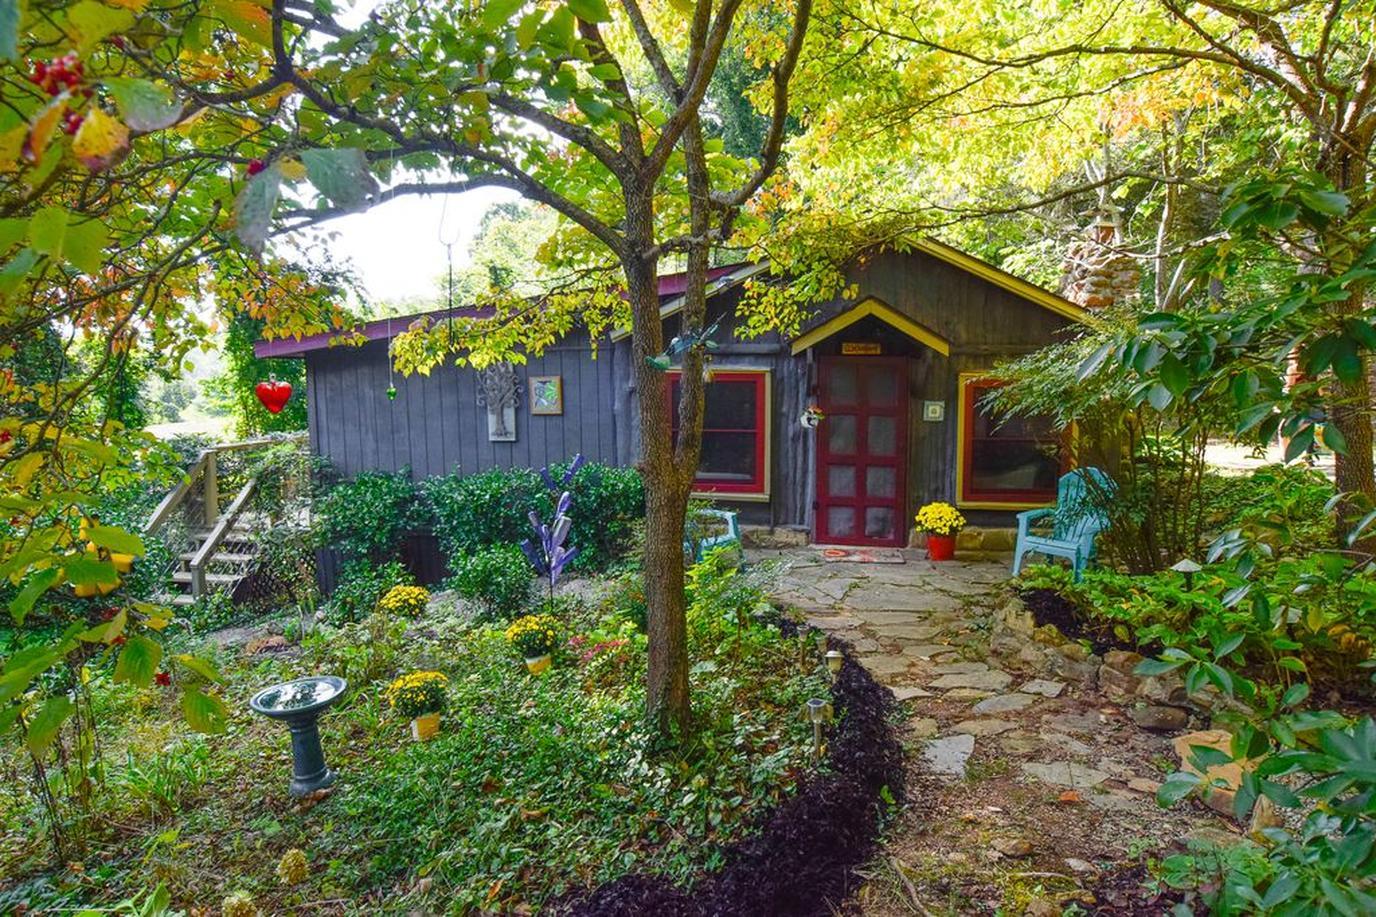 A beautiful cabin at Wishing Tree Cabin